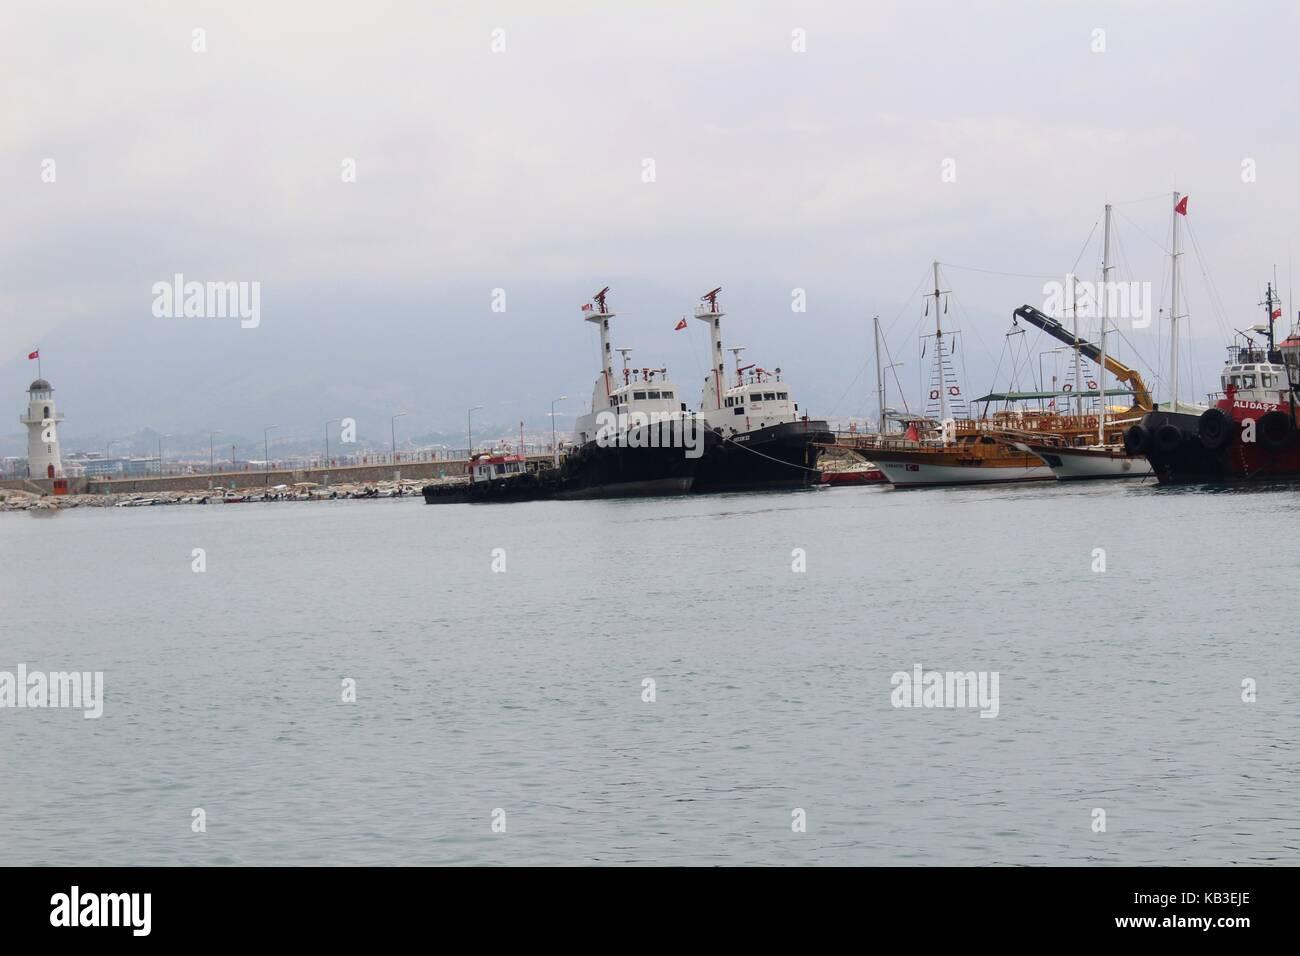 Sea tugs anchored in the city harbor (Antalya, Turkey) in July 2017. - Stock Image